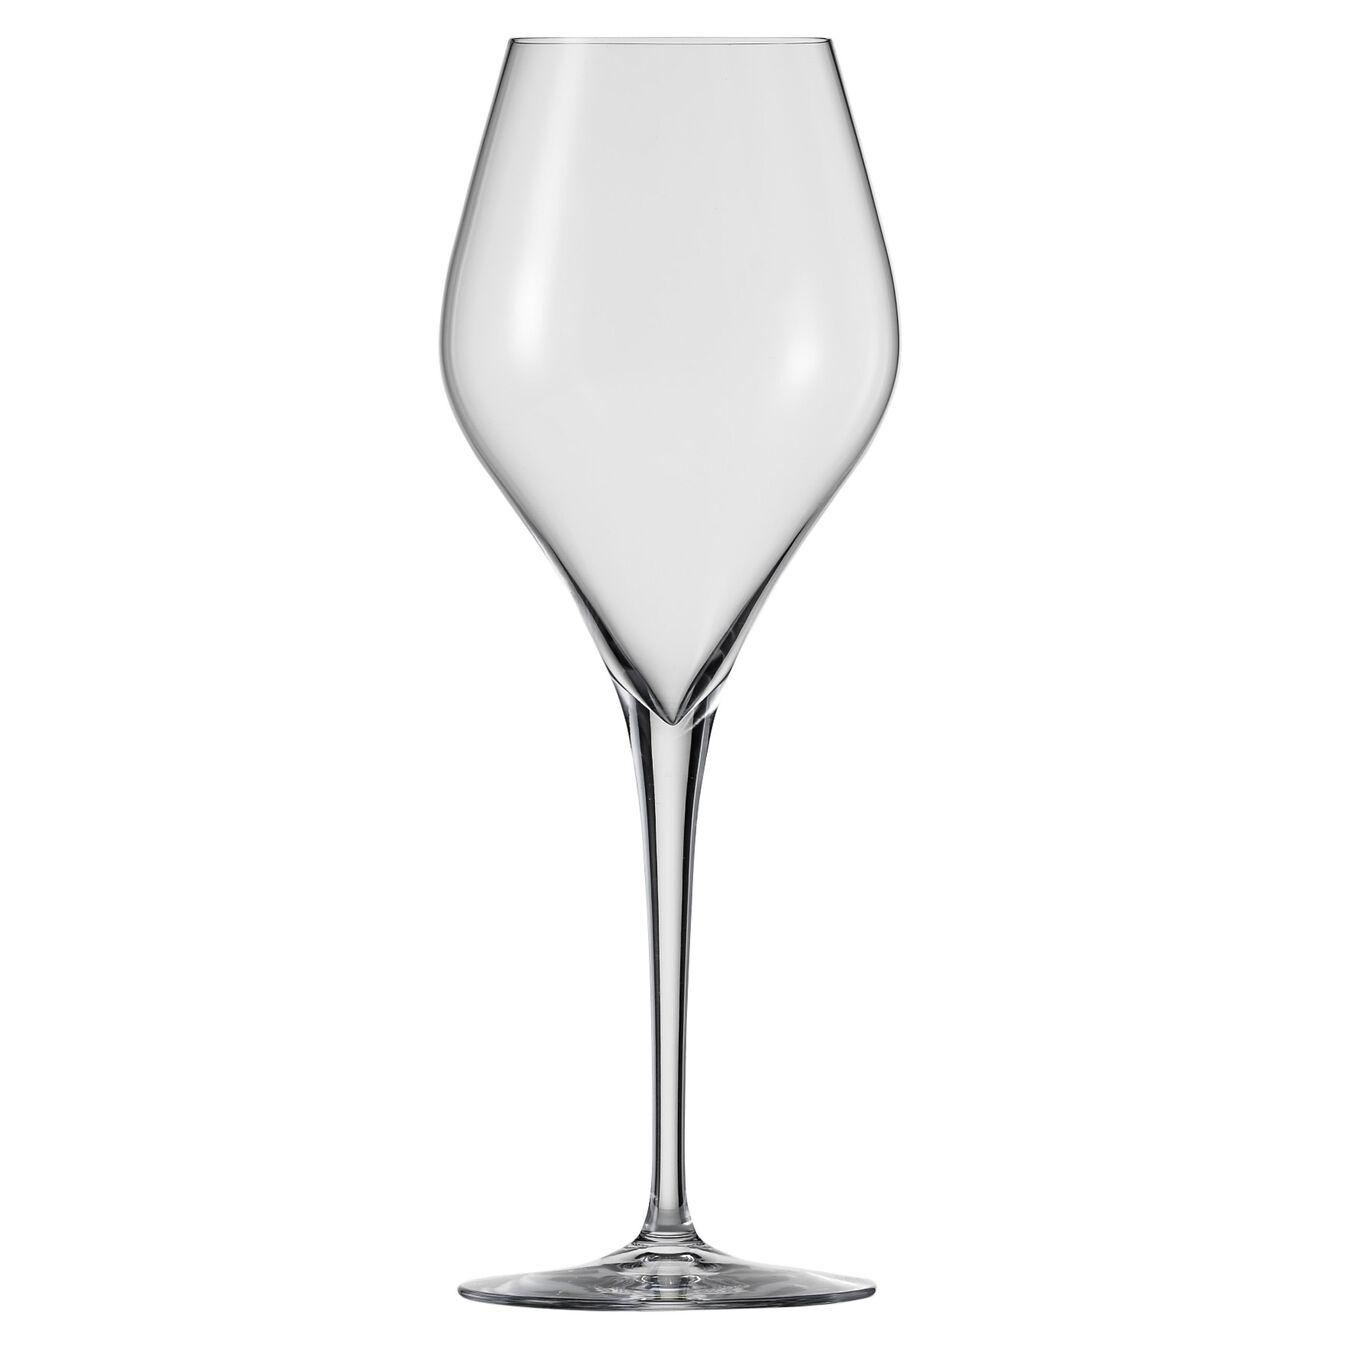 Taça para vinho tinto 430 ml,,large 1